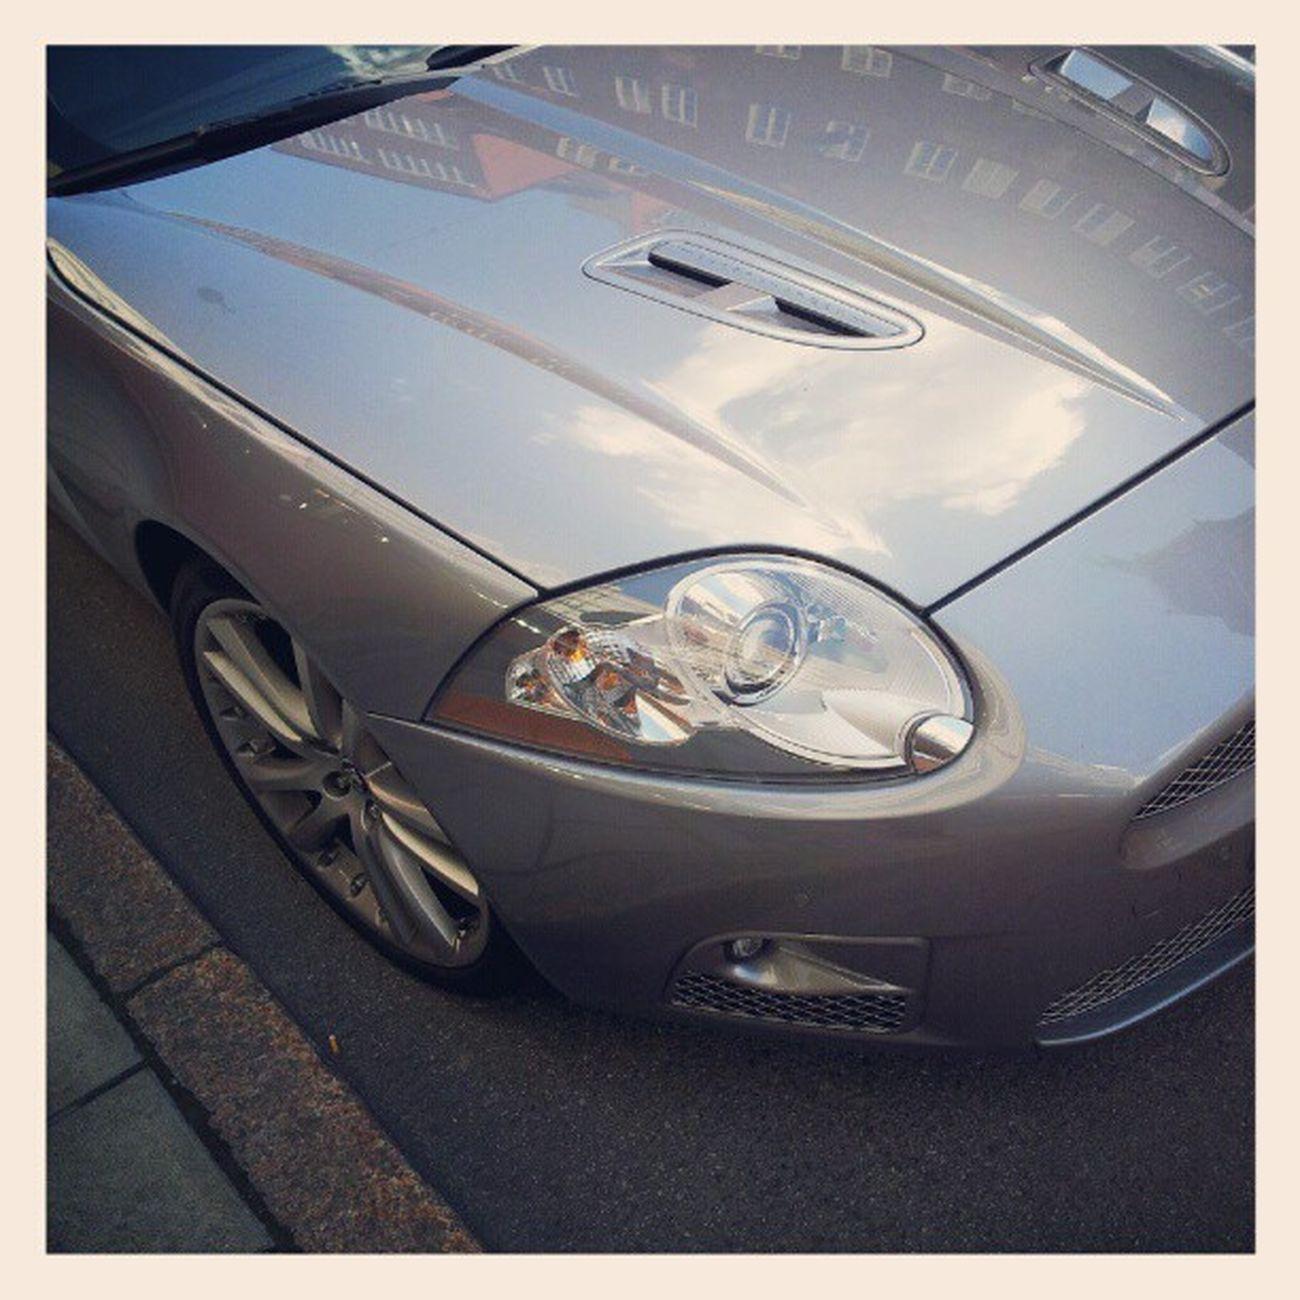 JAGUAR Xkr Jag British luxury sportscar cool cargramm